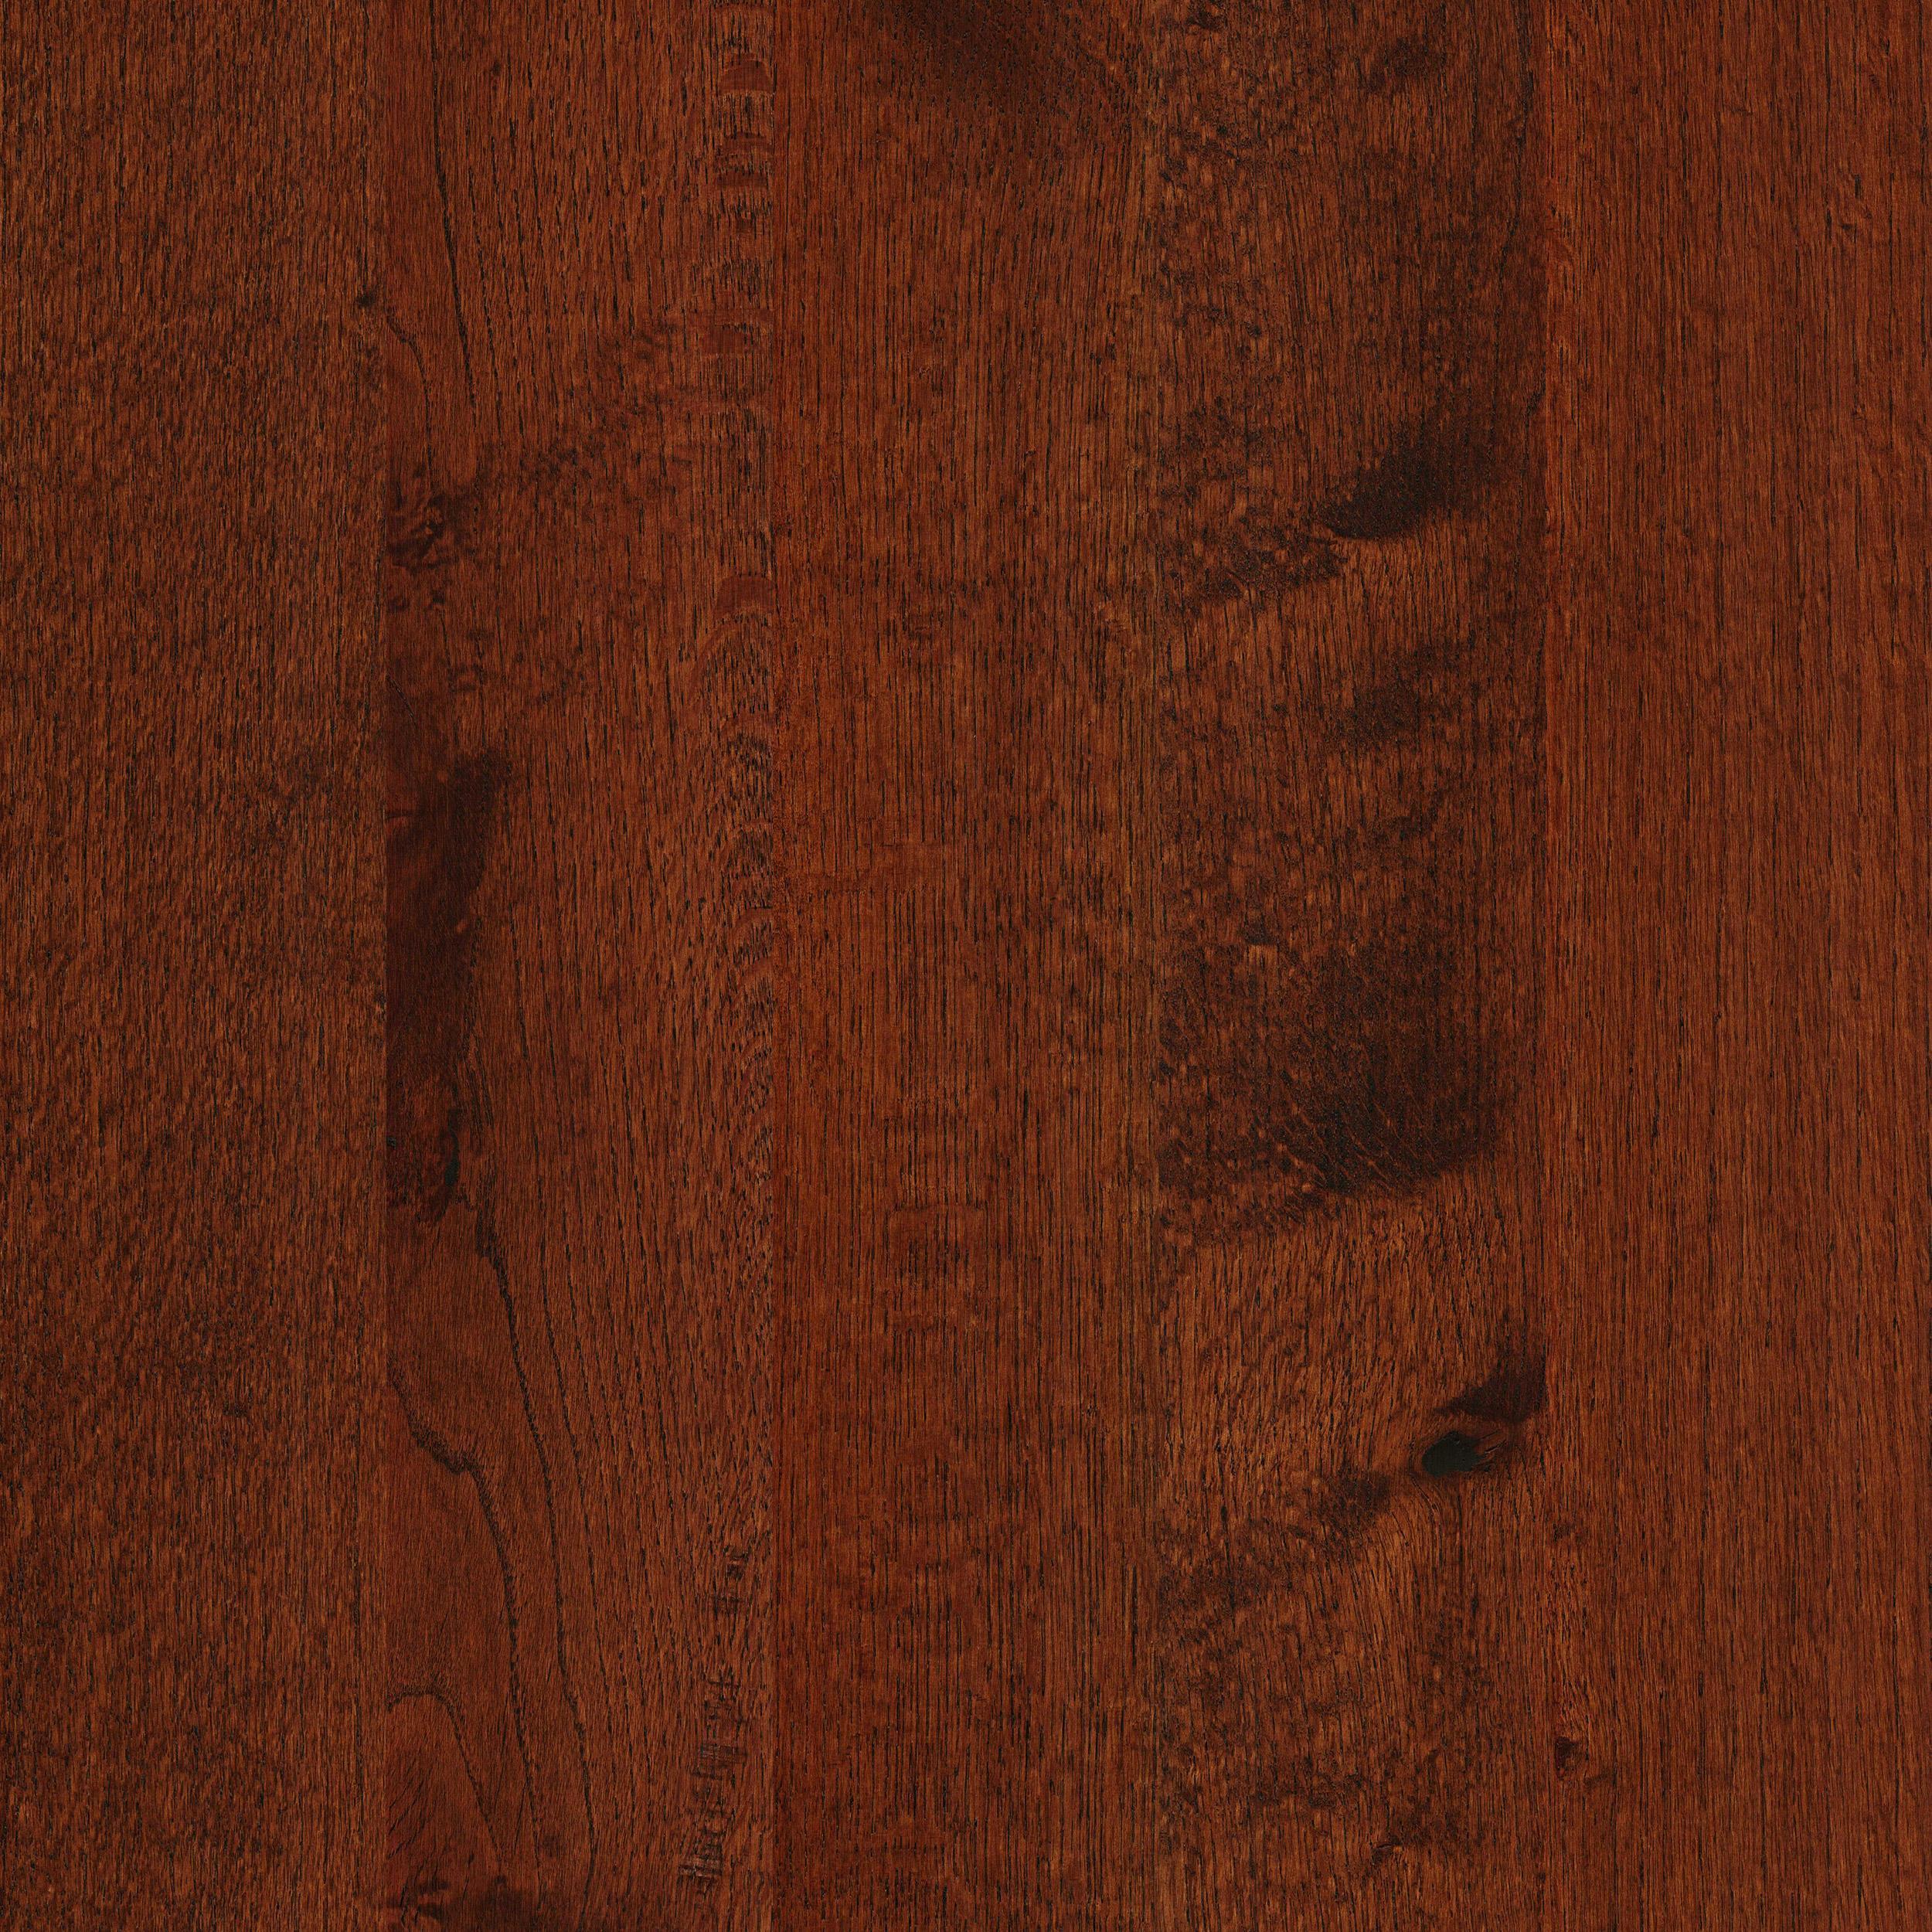 rustic wide plank engineered hardwood flooring of timber hardwood red oak sorrell 5 wide solid hardwood flooring with regard to red oak sorrell timber solid approved bk